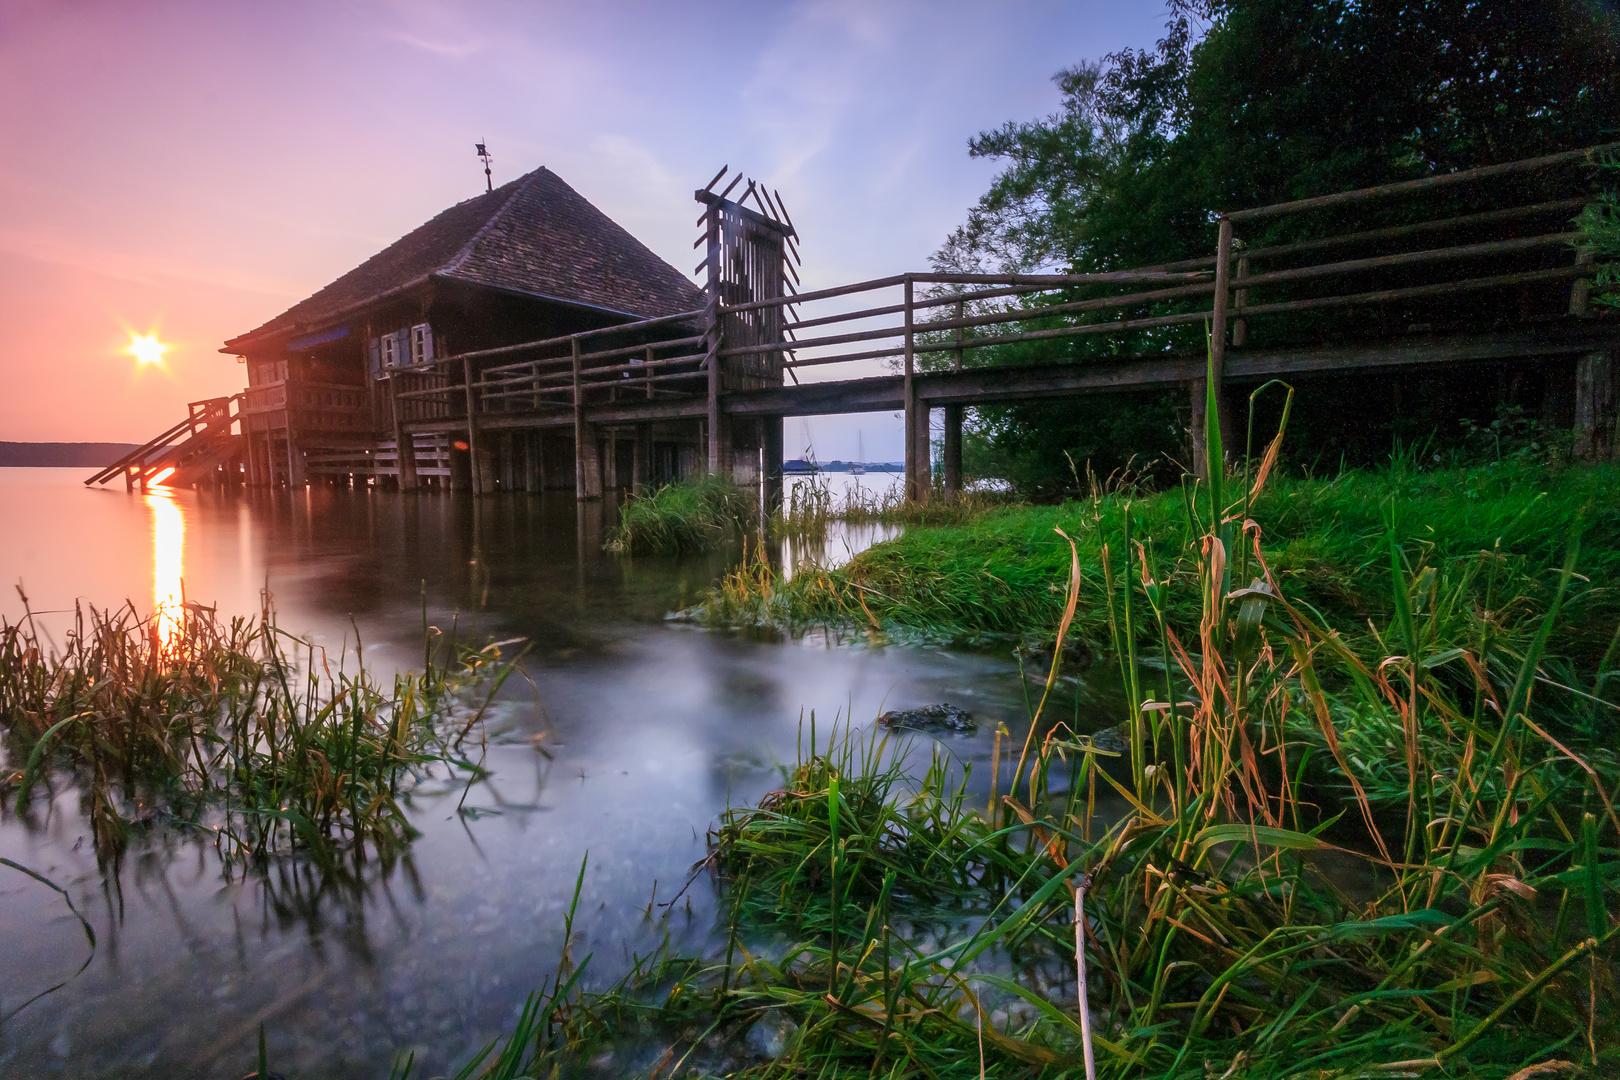 Bootshütte am Ammersee 2